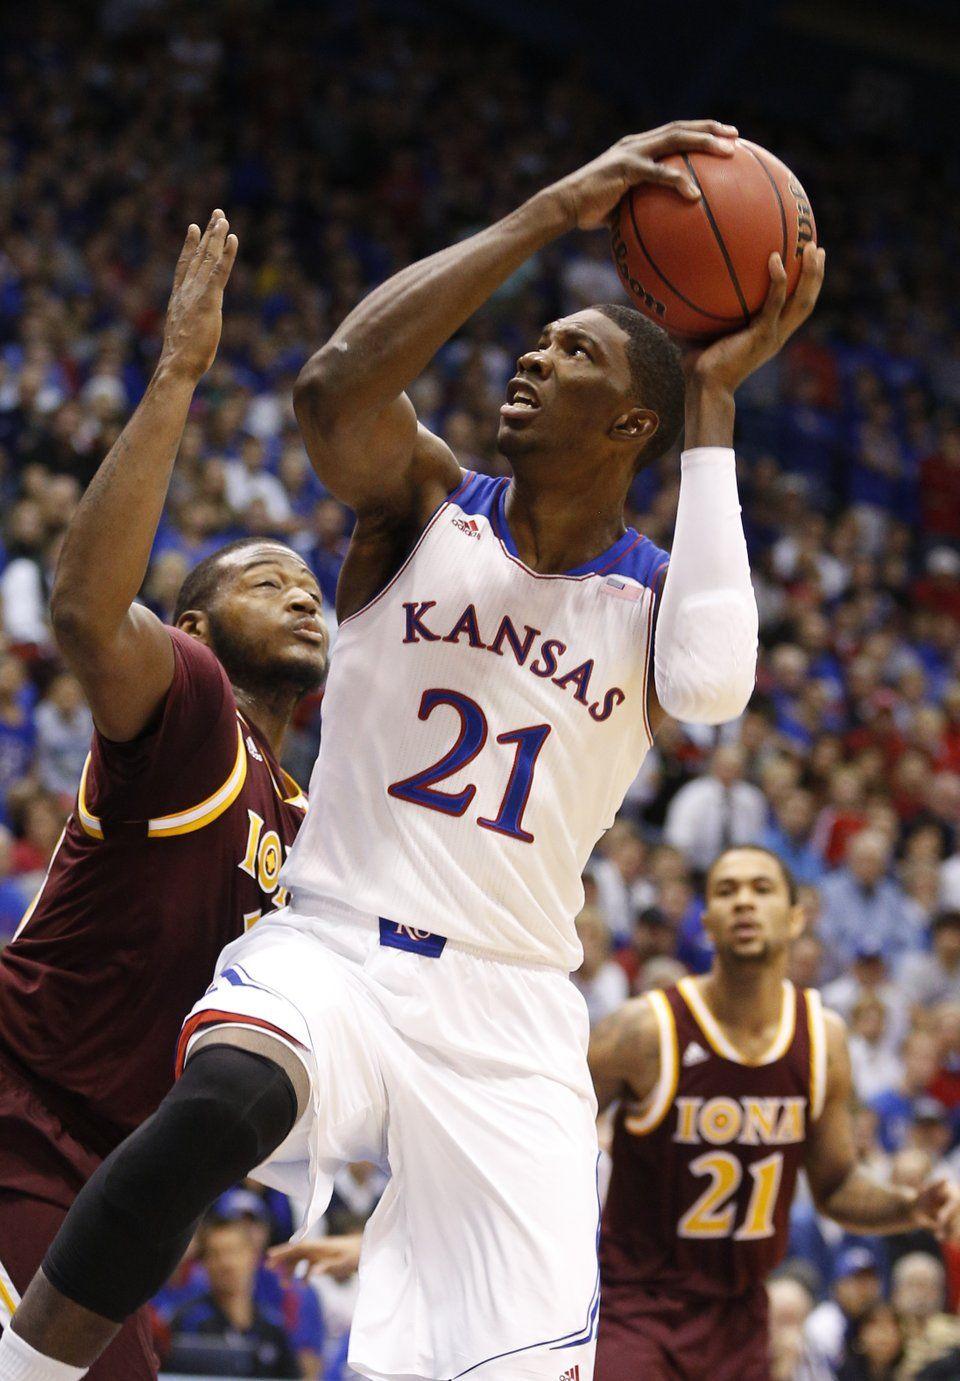 2014 Joel Embiid Kansas Kansas jayhawks basketball